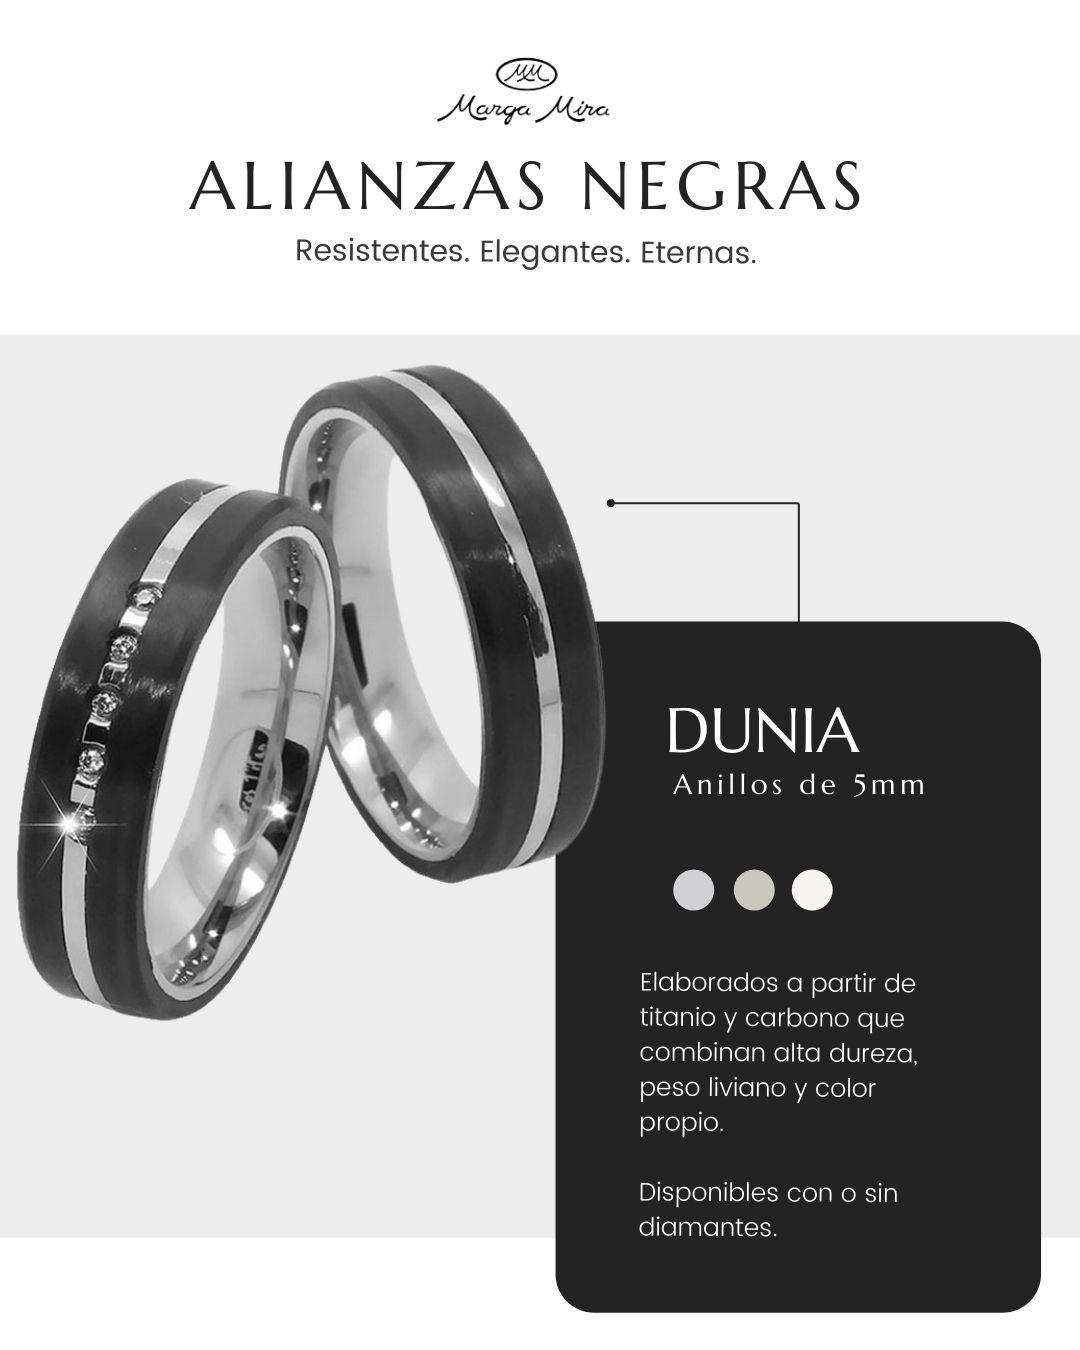 dunia anillo negro diamantes - donde comprar alianzas negras titanio carbono - joyeria marga mira